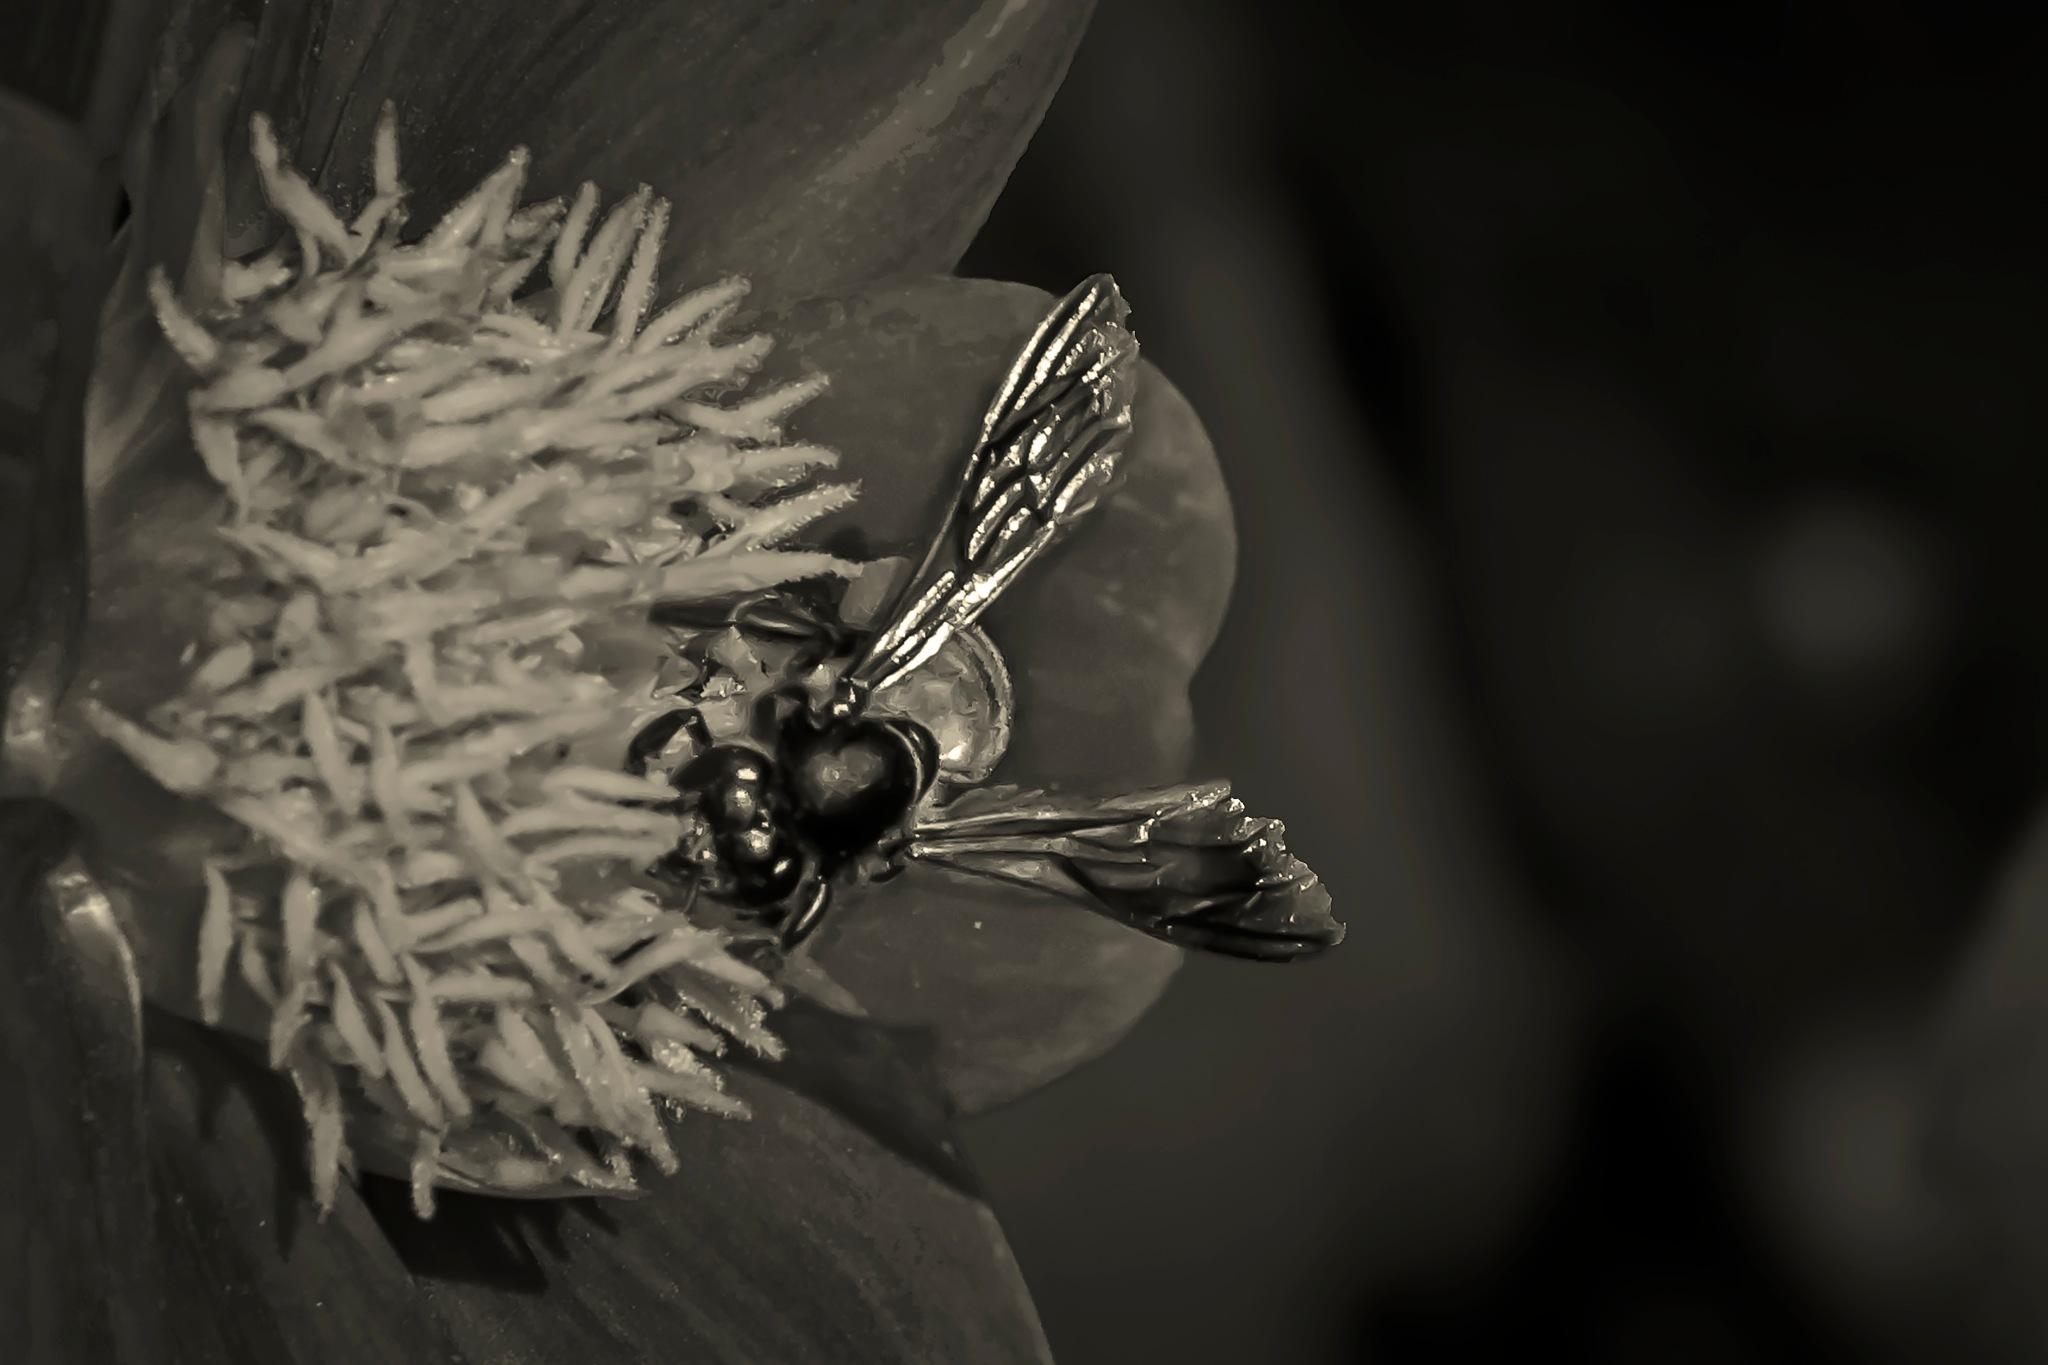 Honey Bee by Swami Prem Sangeet ( Sanjay Jaiswal )